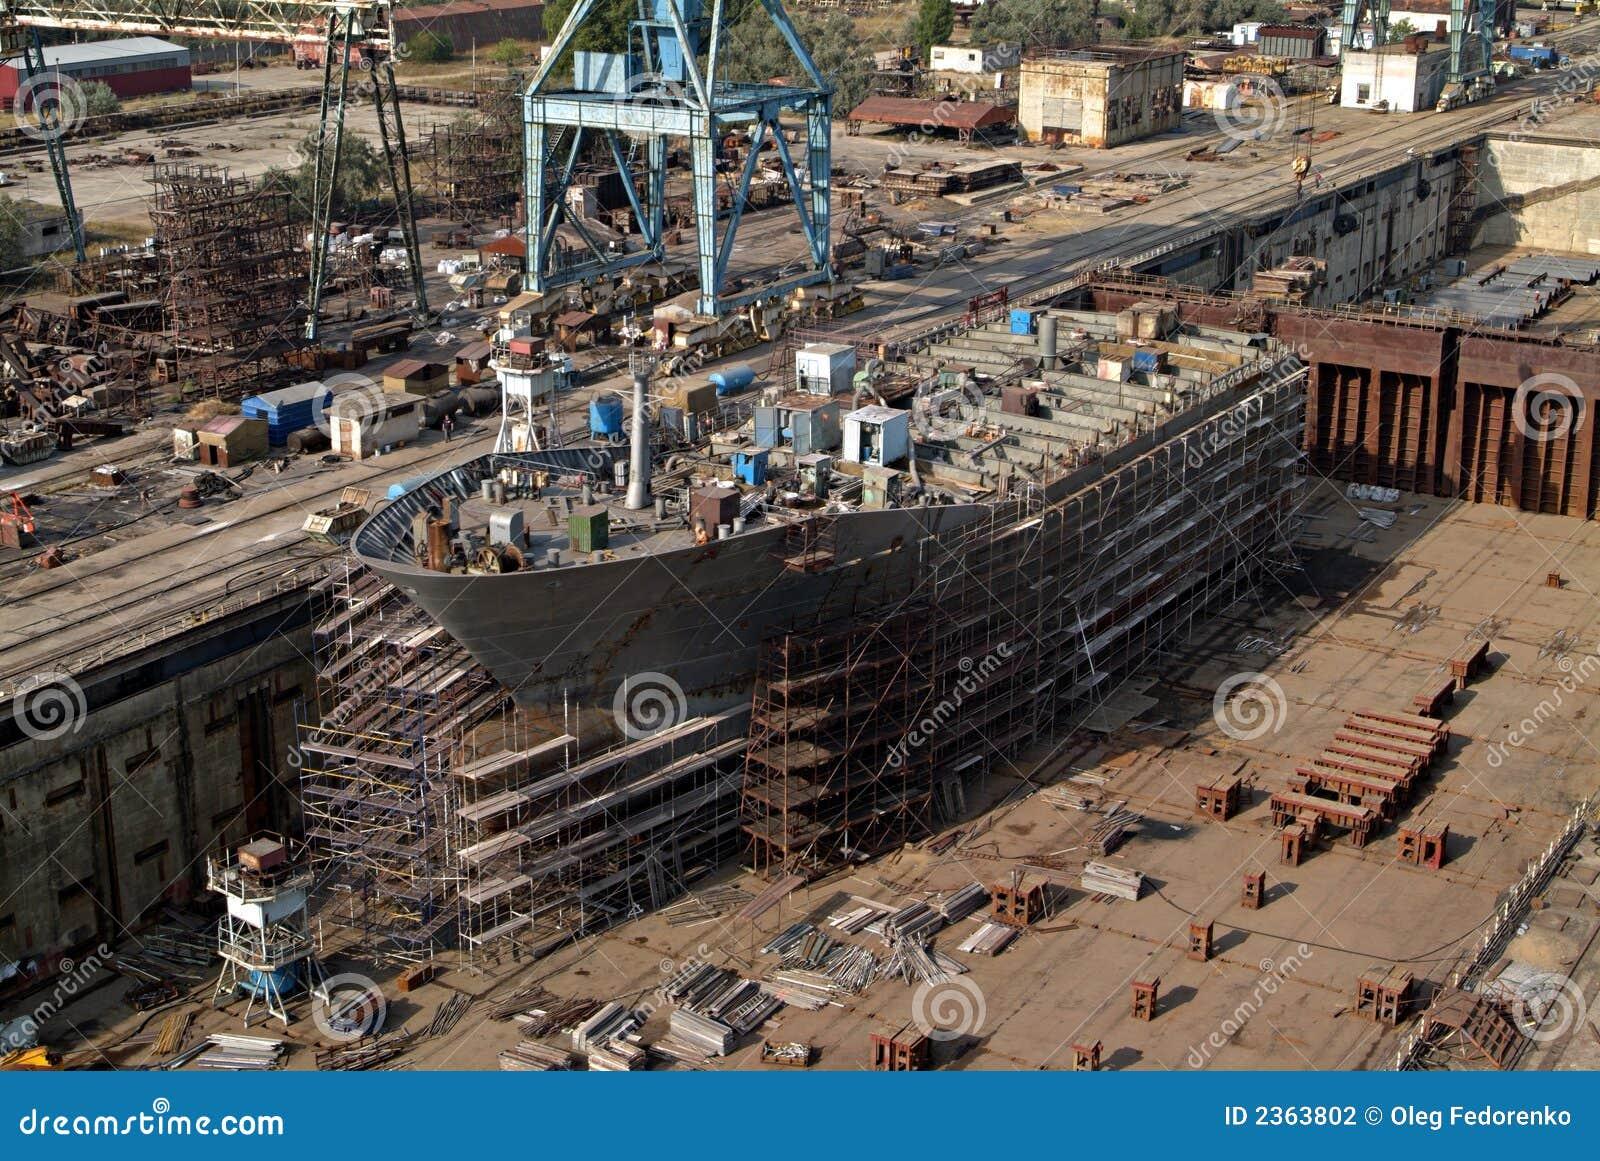 Shipbuilding, ship repair